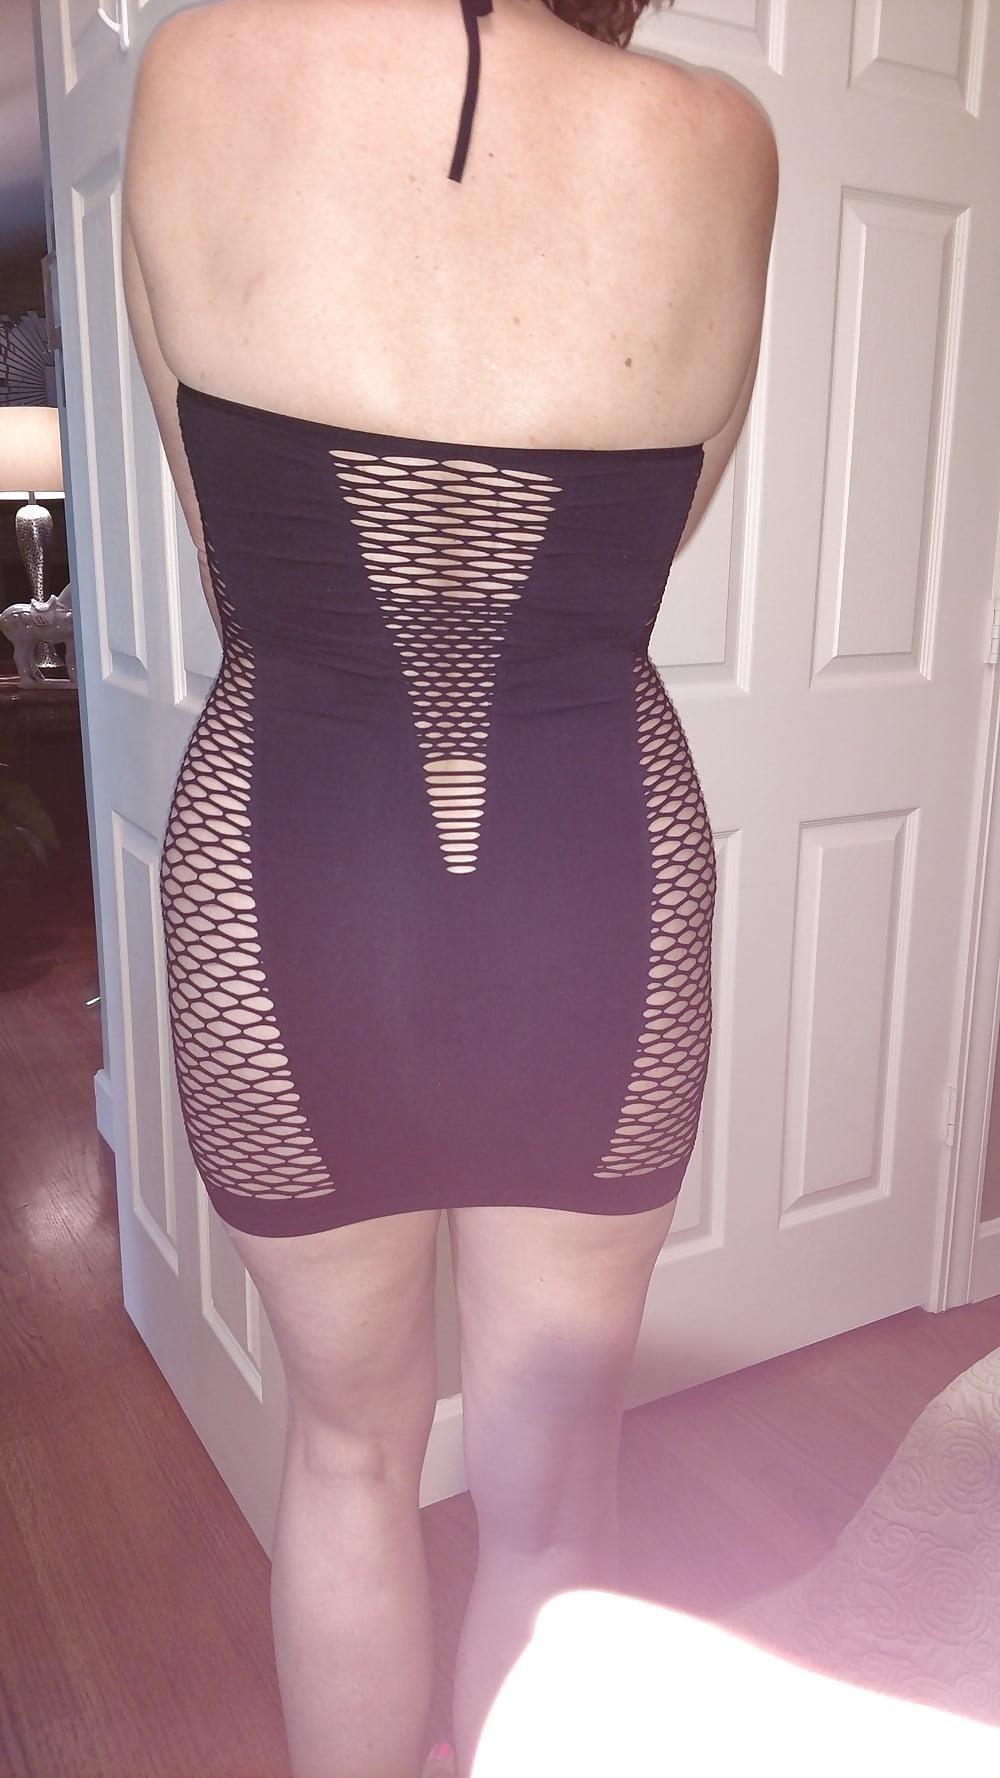 Milfs in lingerie pics-8135